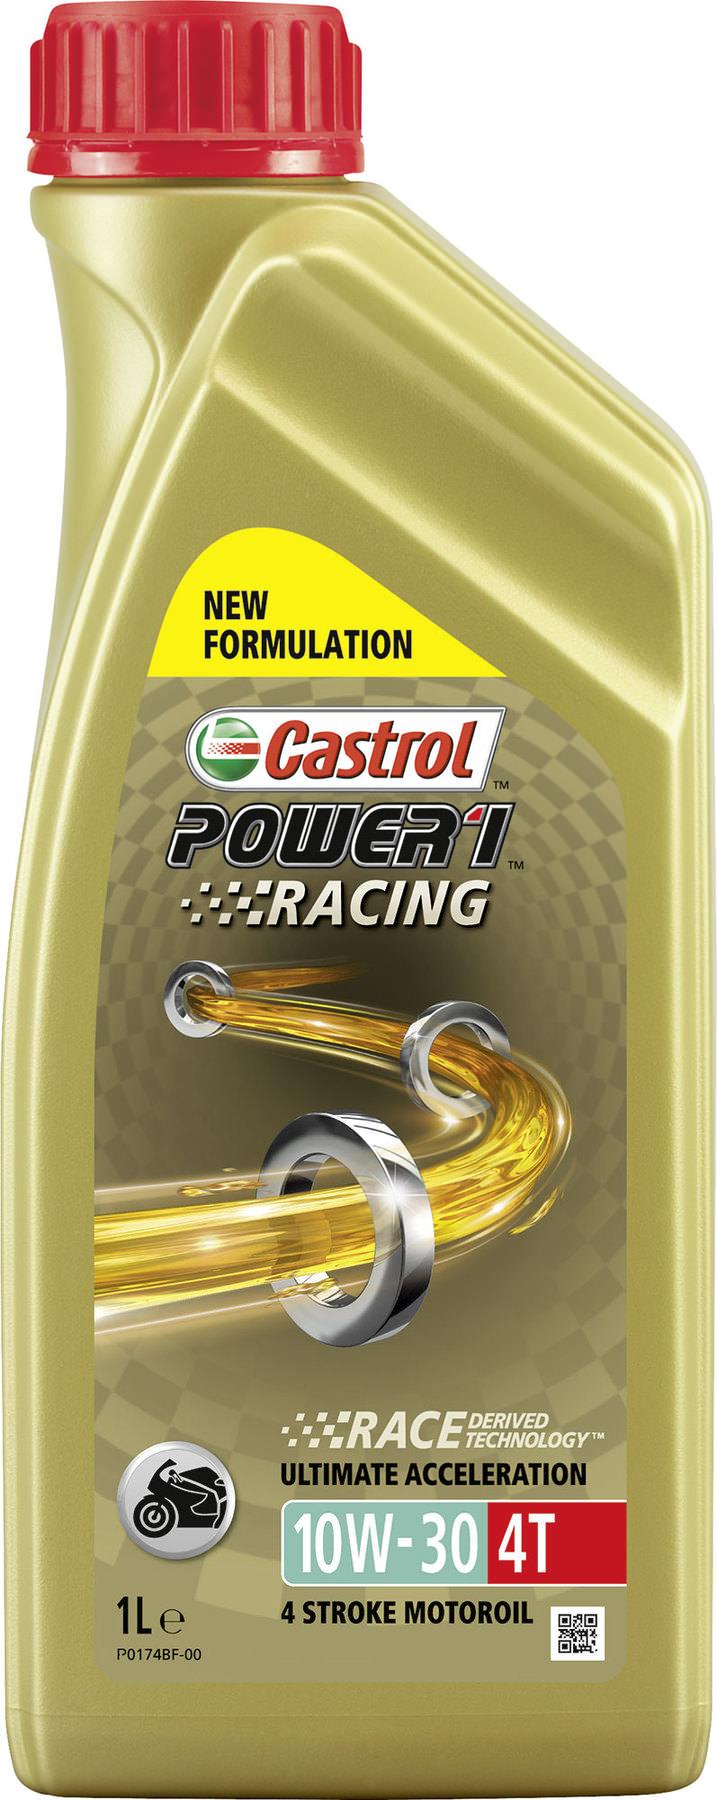 Castrol Power1 4T 10W-30 Oil - 1L